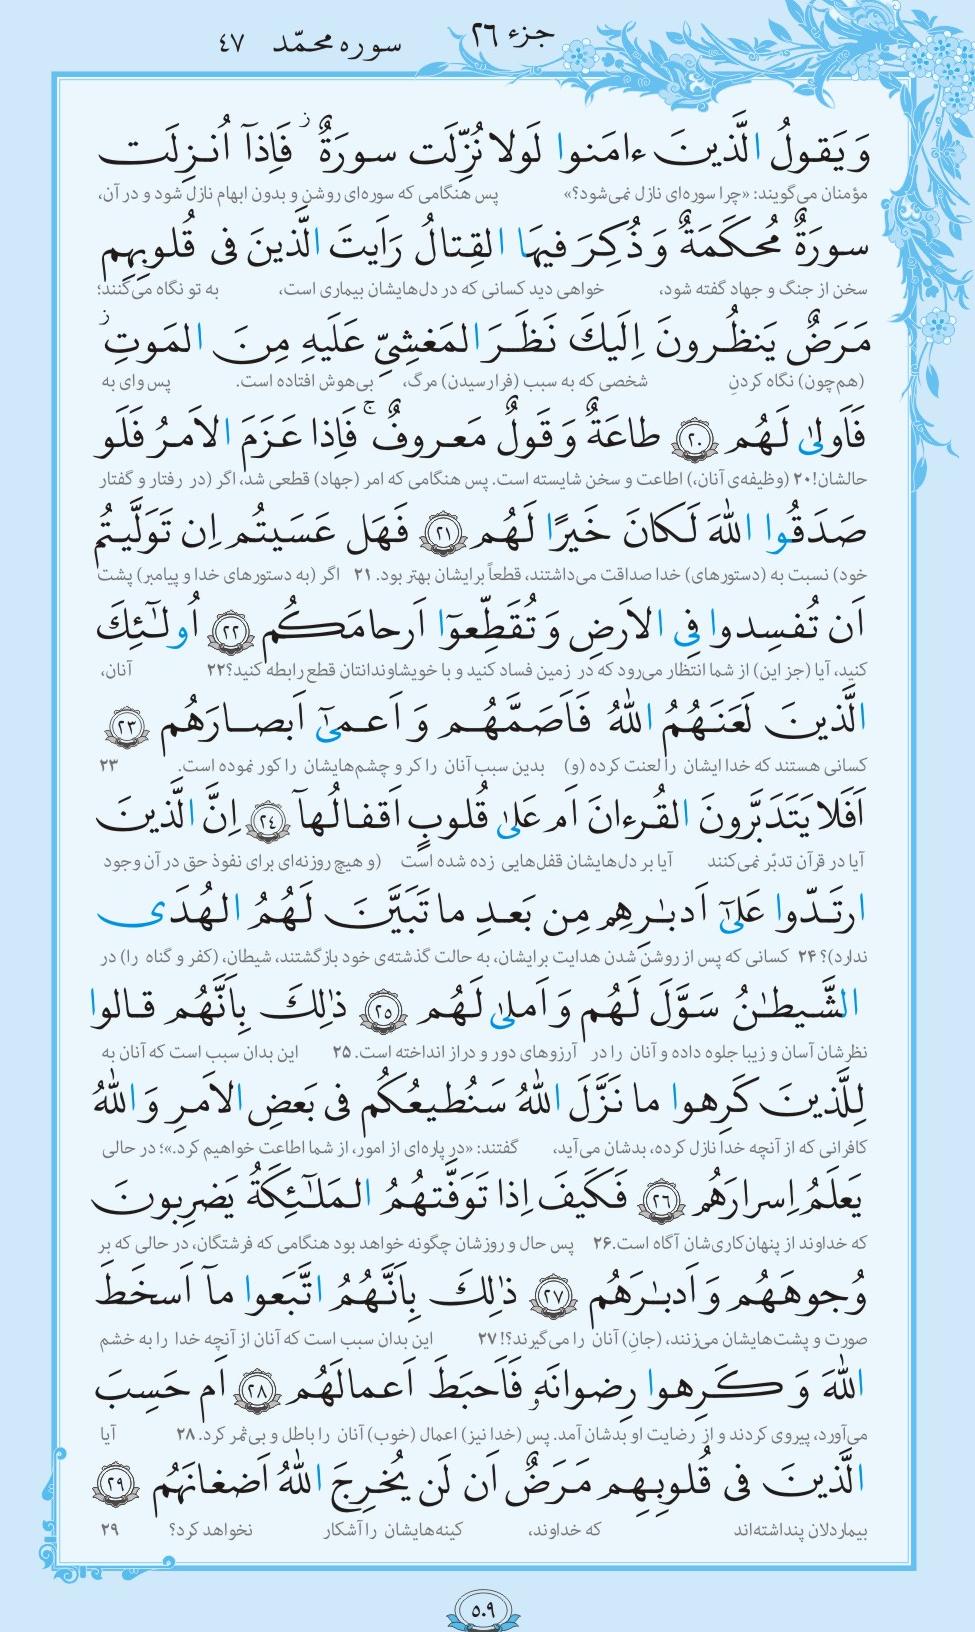 13990719000800 Test NewPhotoFree - ترتیل صفحه ۵۰۹ قرآن کریم+فیلم و متن آیات